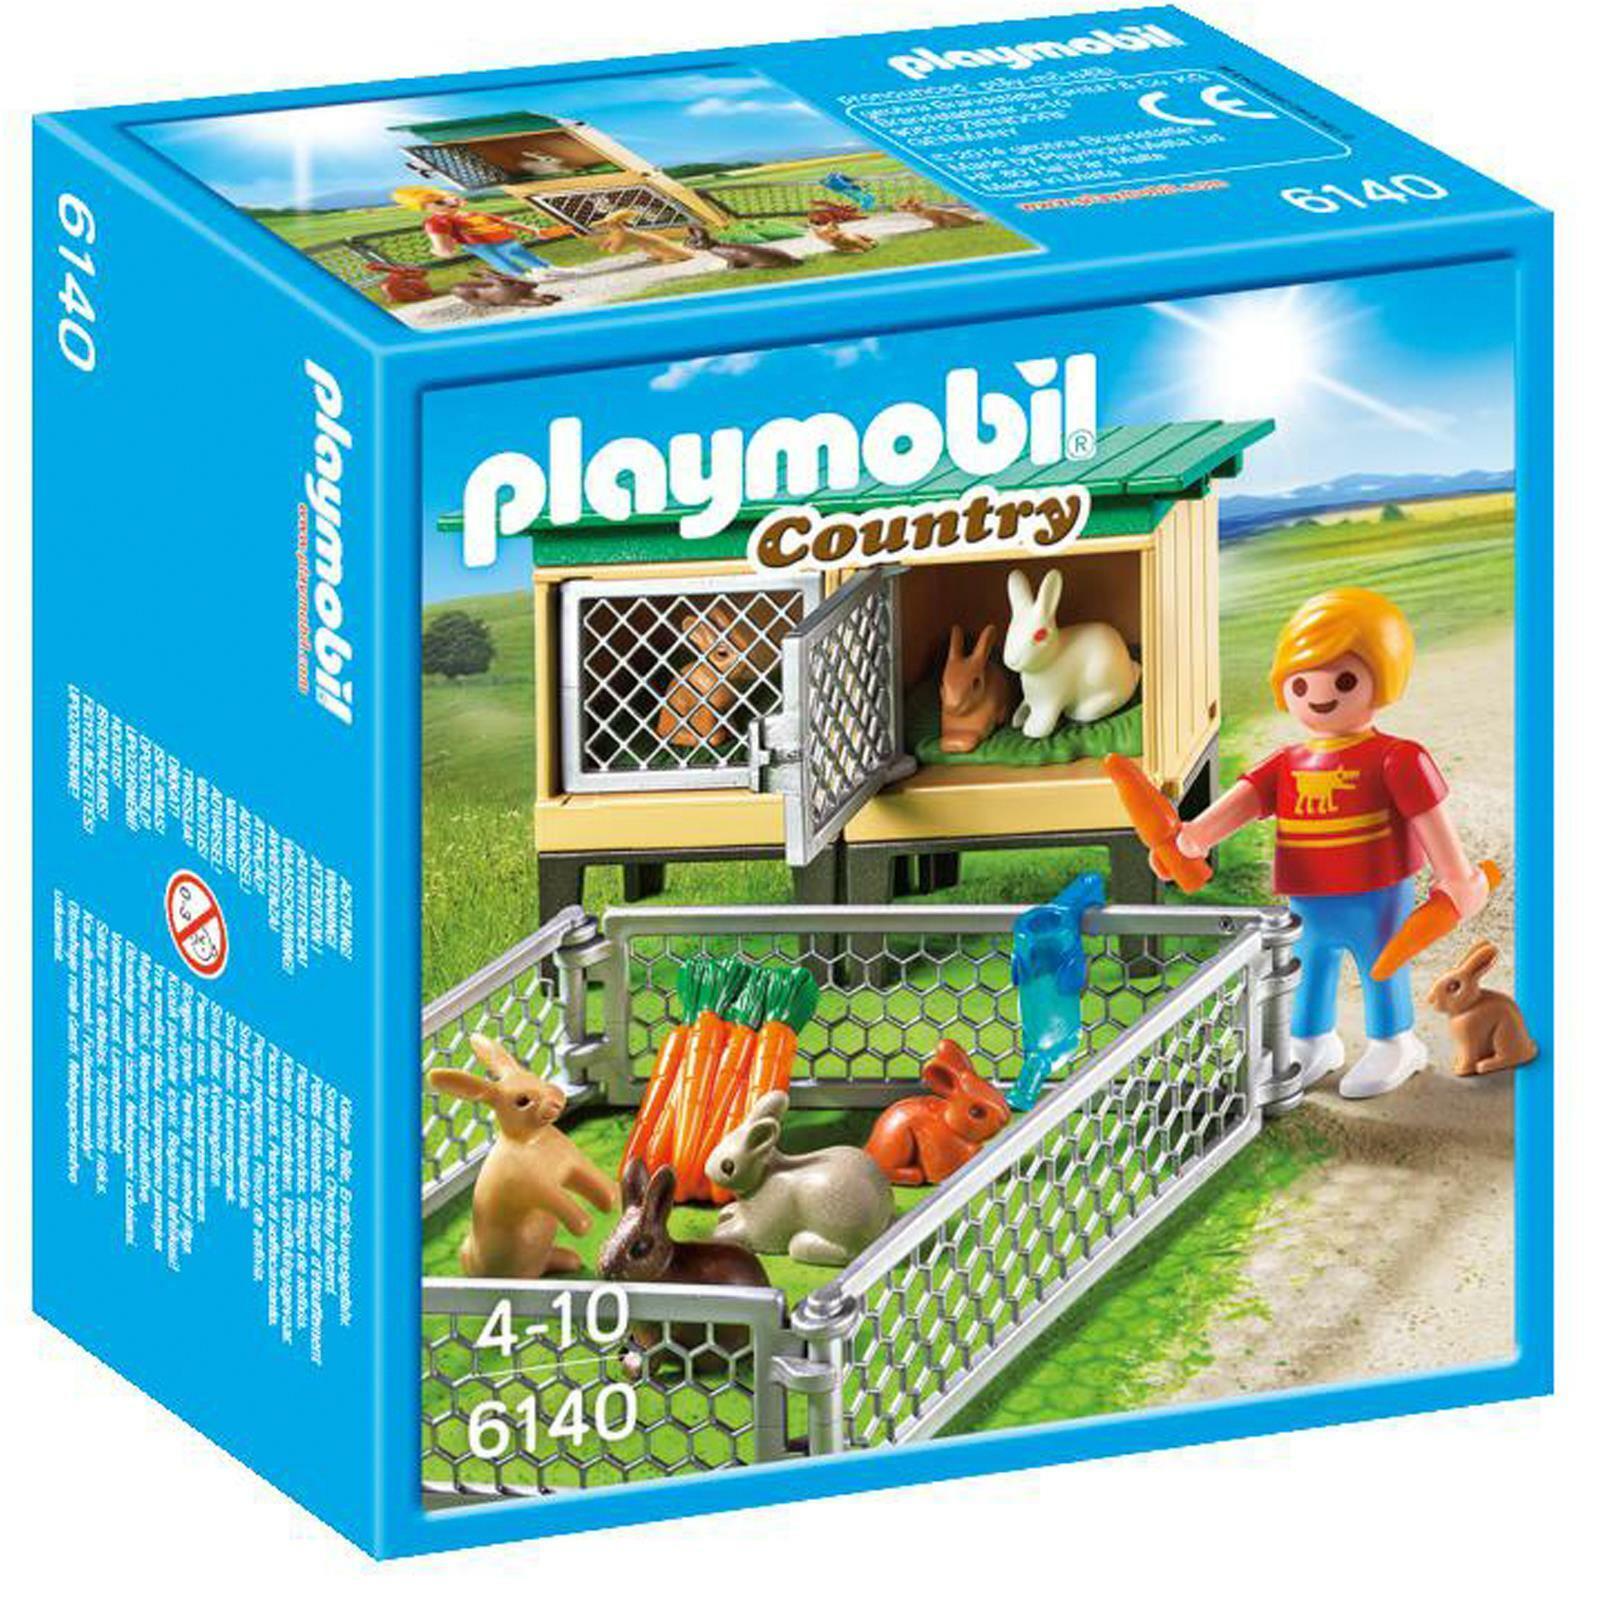 Playmobil Promo 30791393 Mann und Frau neu und OVP im Polybeutel